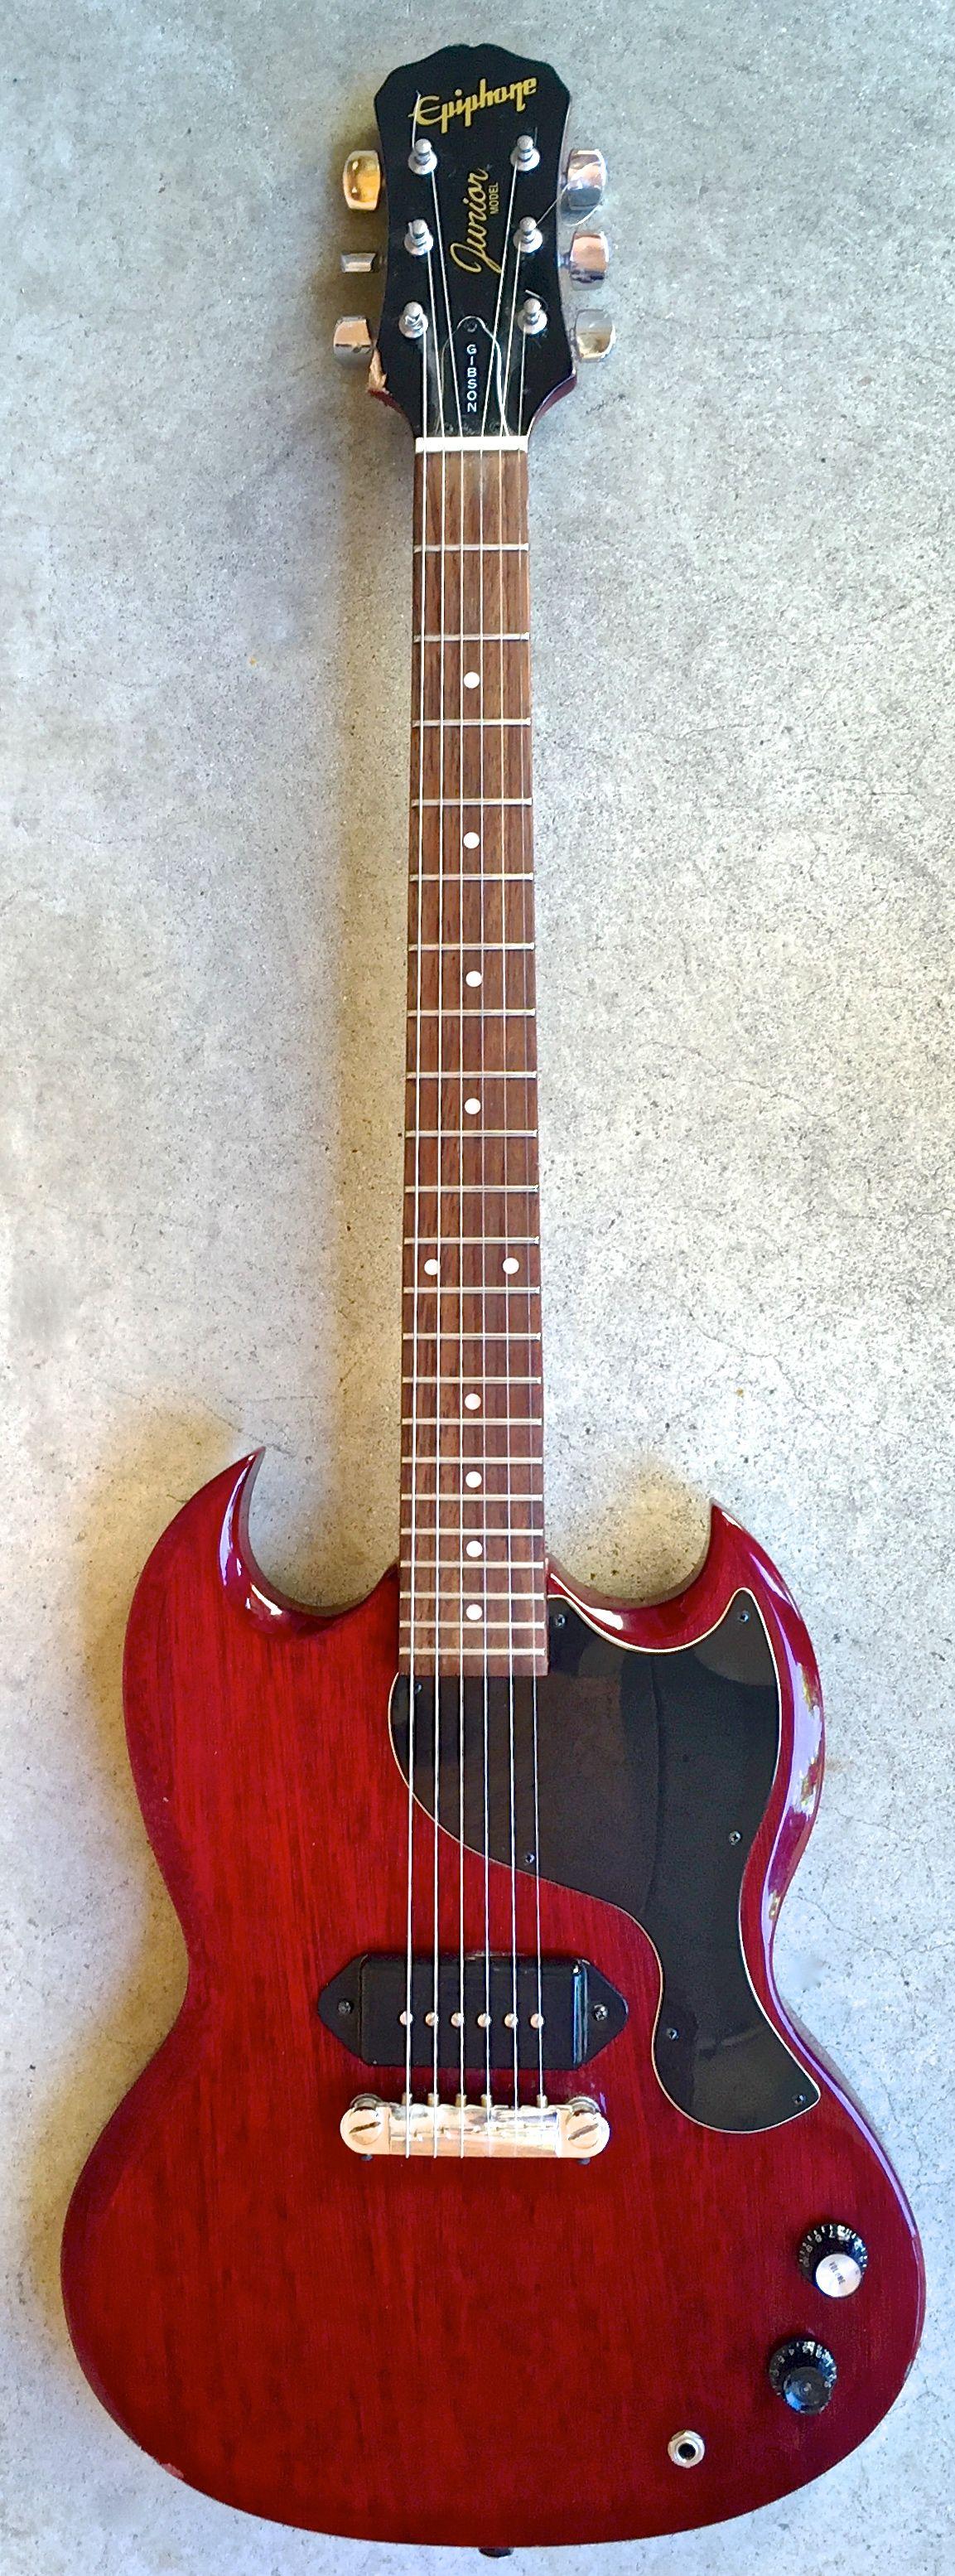 1997 Epiphone SG Junior | Electric Guitars #Guitarporn in